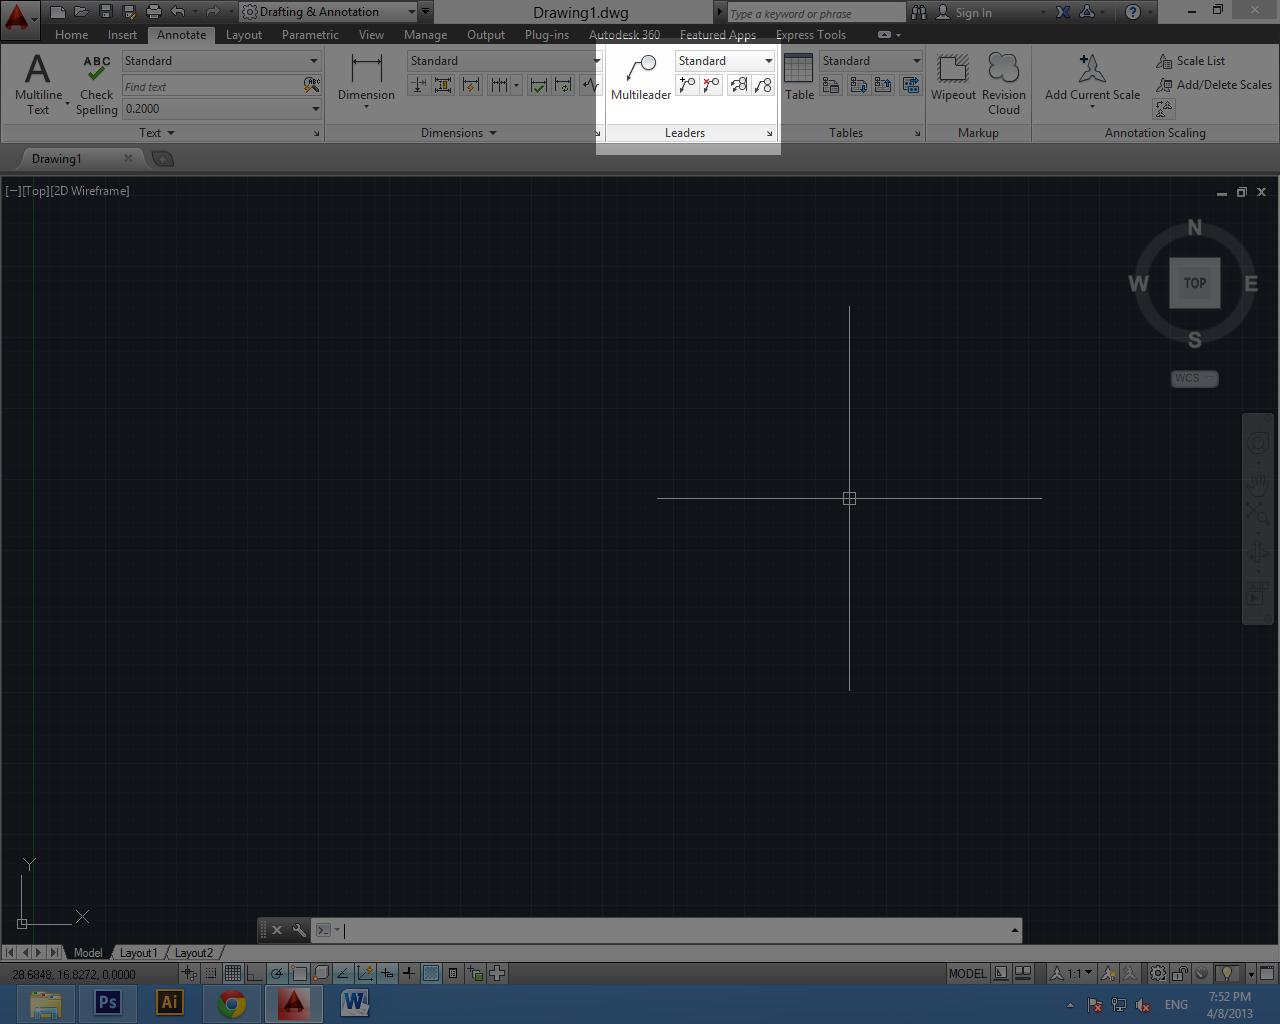 110802_screenshot_2_1.png